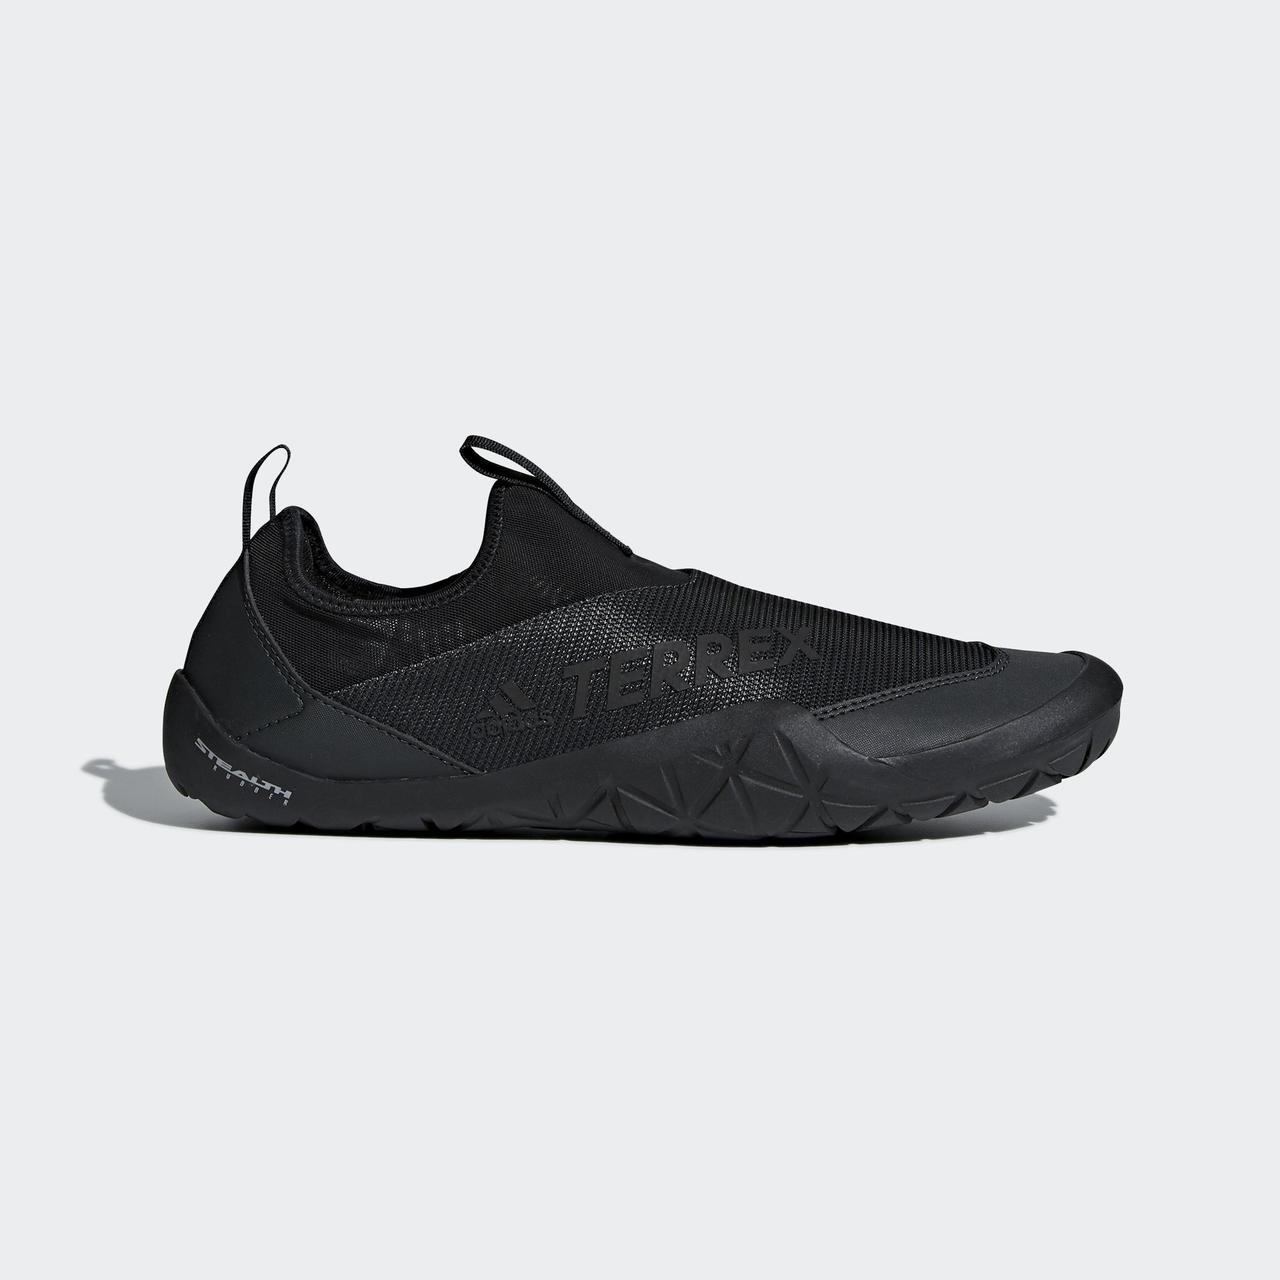 Коралловые тапочки Adidas Terrex Climacool Jawpaw